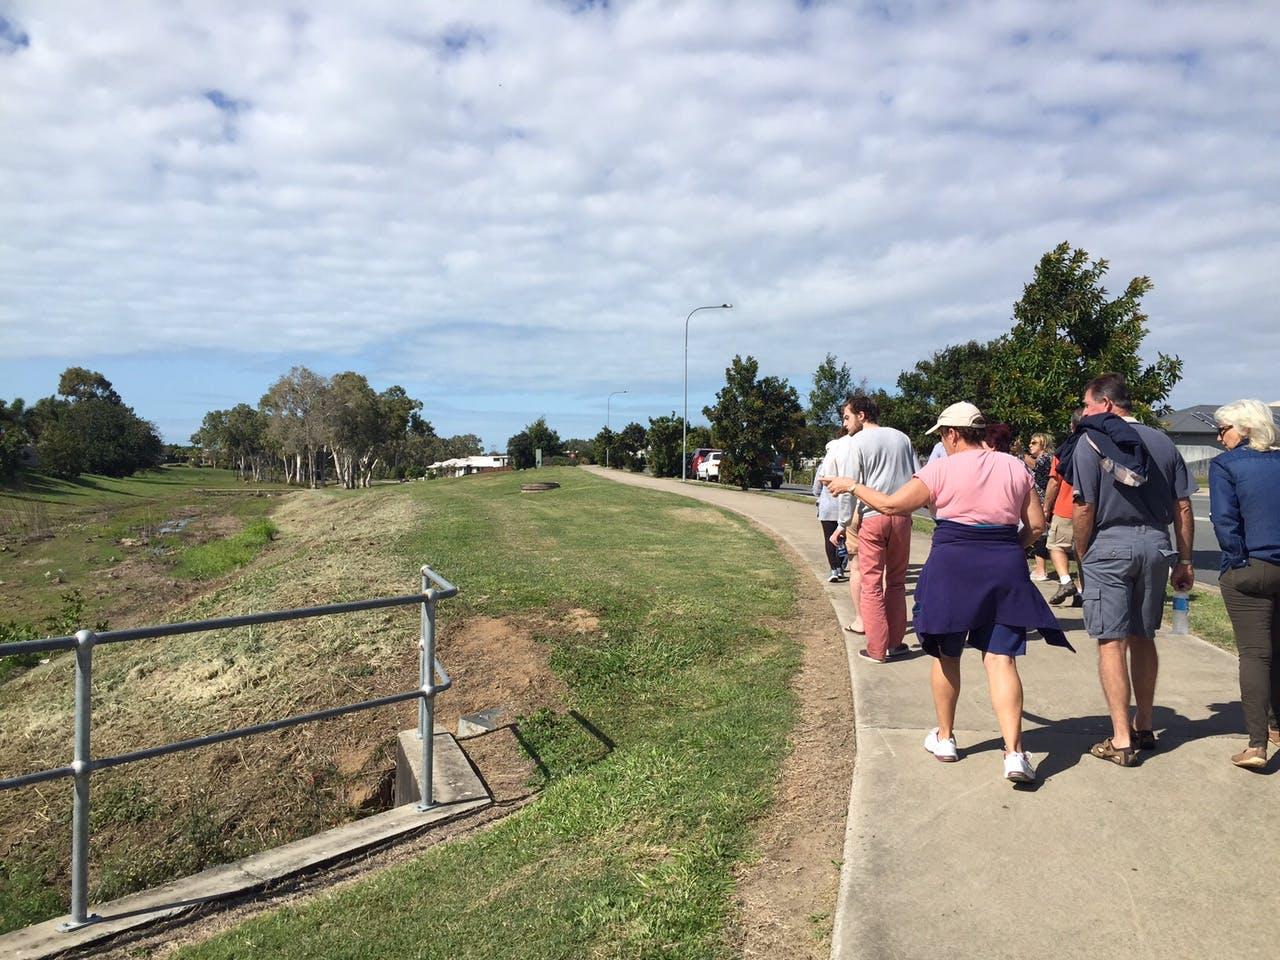 Walking through the site